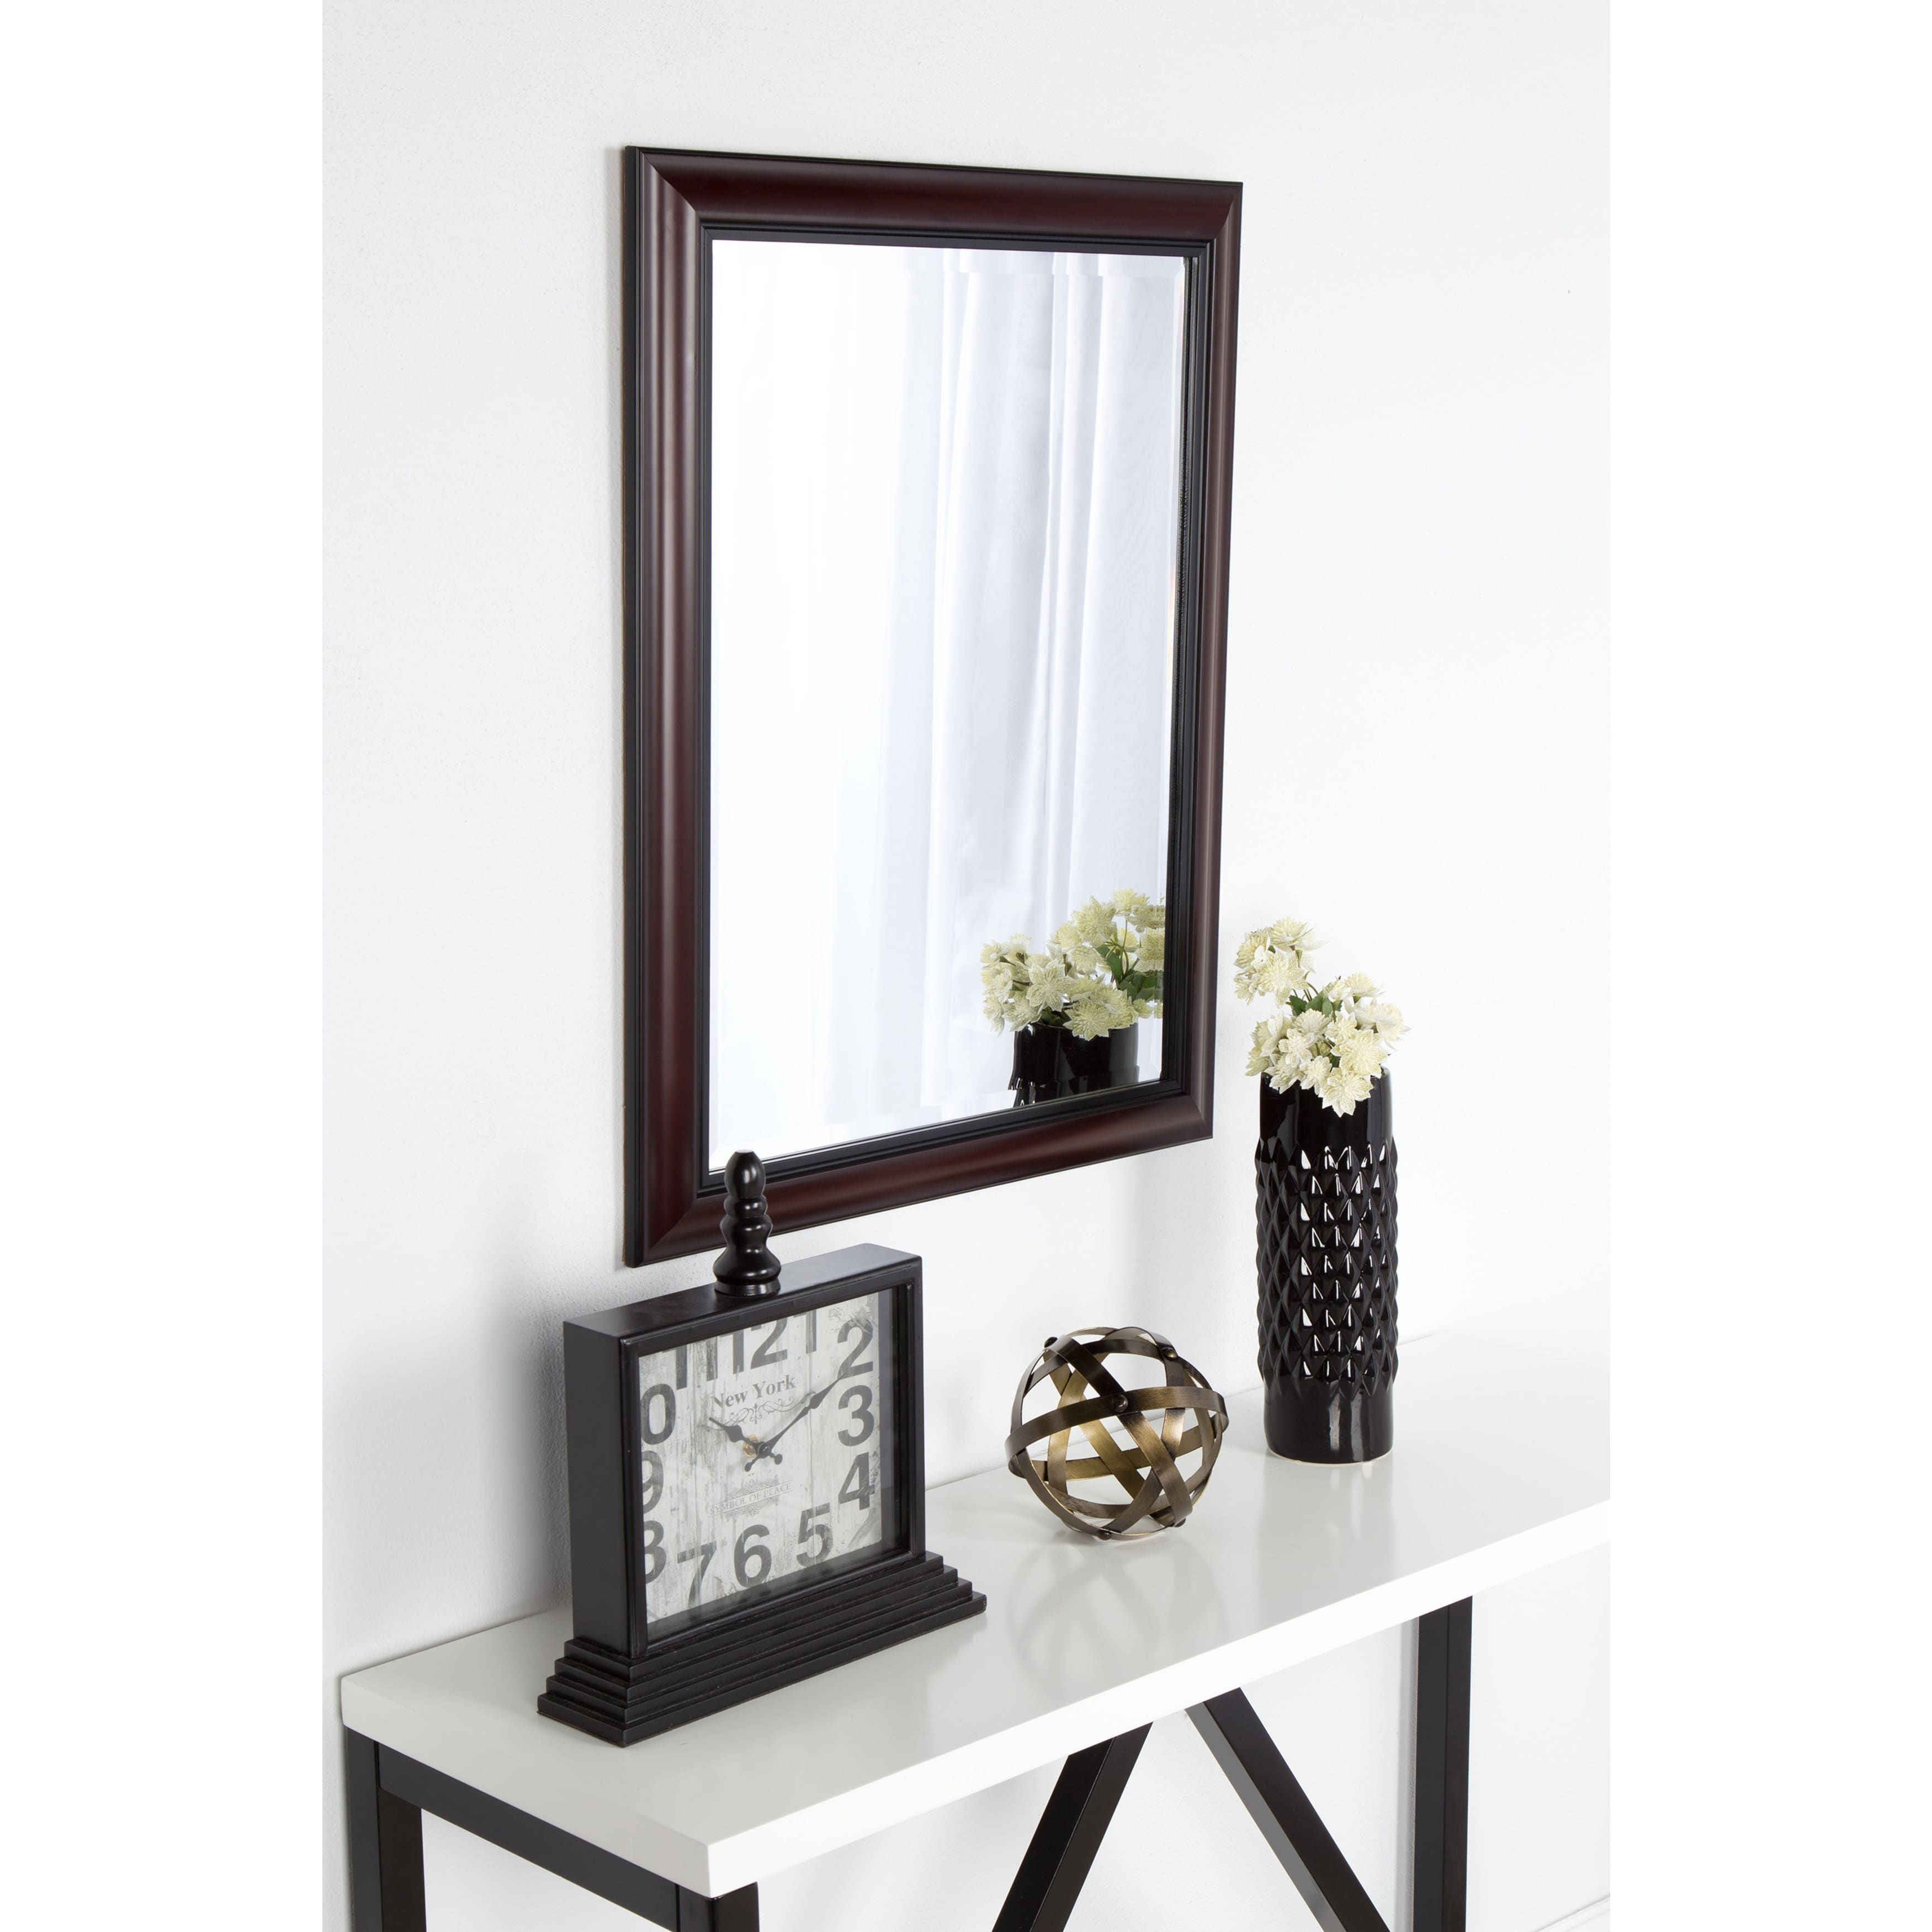 DesignOvation Dalat Cherry Framed Beveled Wall Mirror   Overstock ...